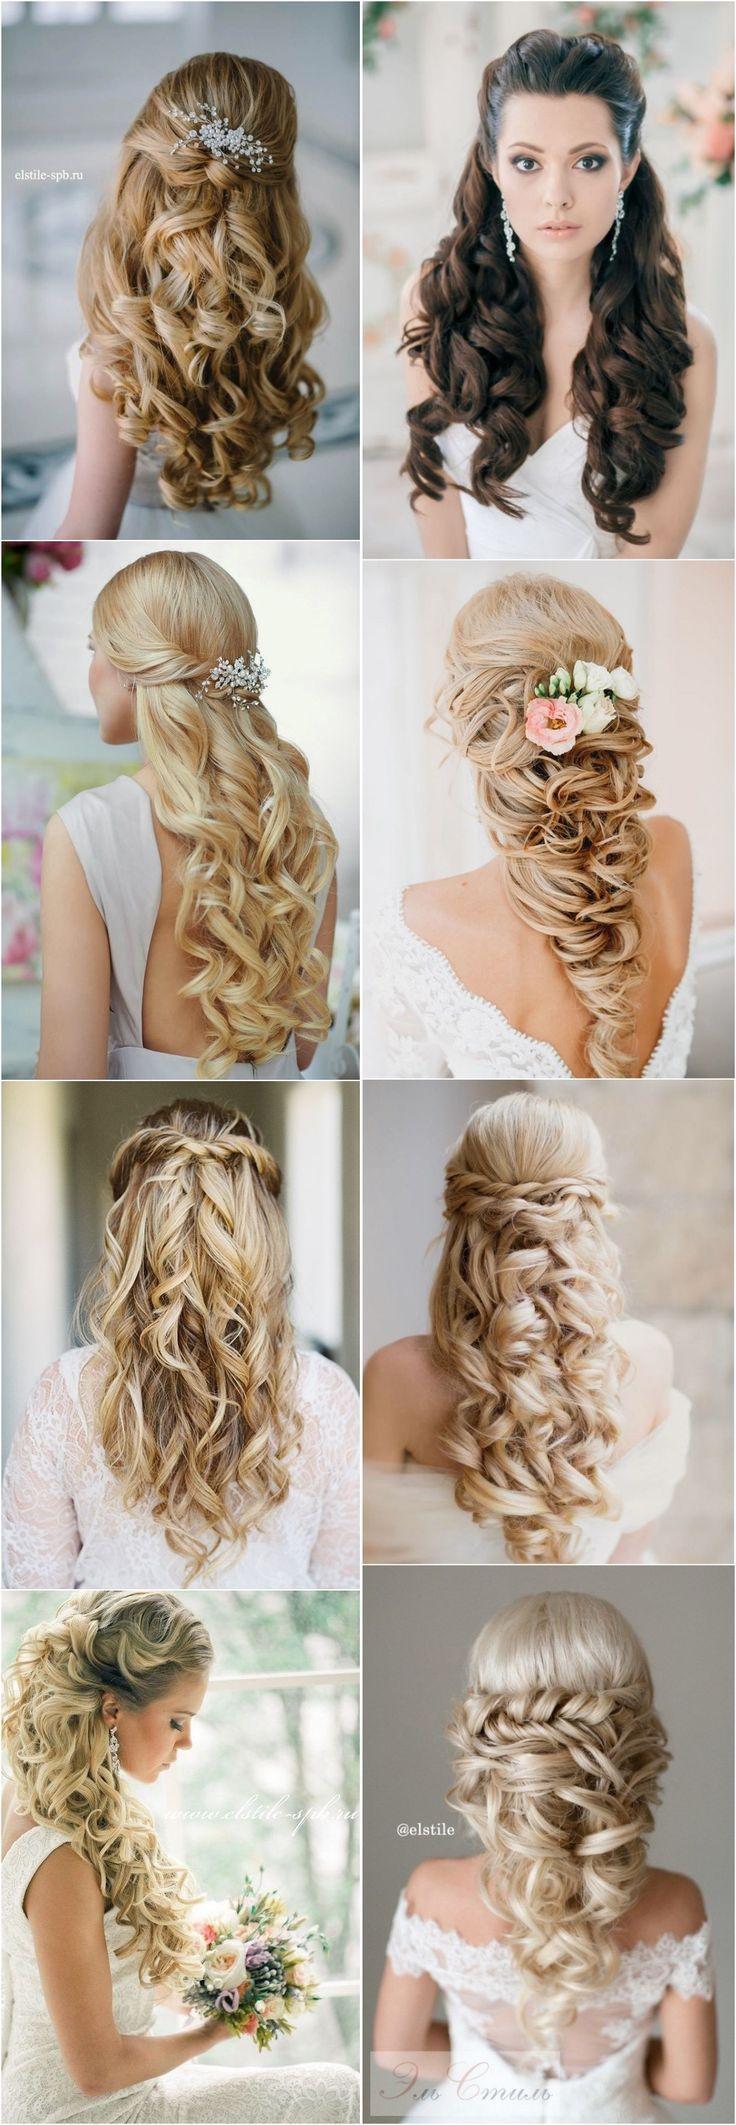 15 Stunning Half Up Half Down Wedding Hairstyles With Tutorial ...